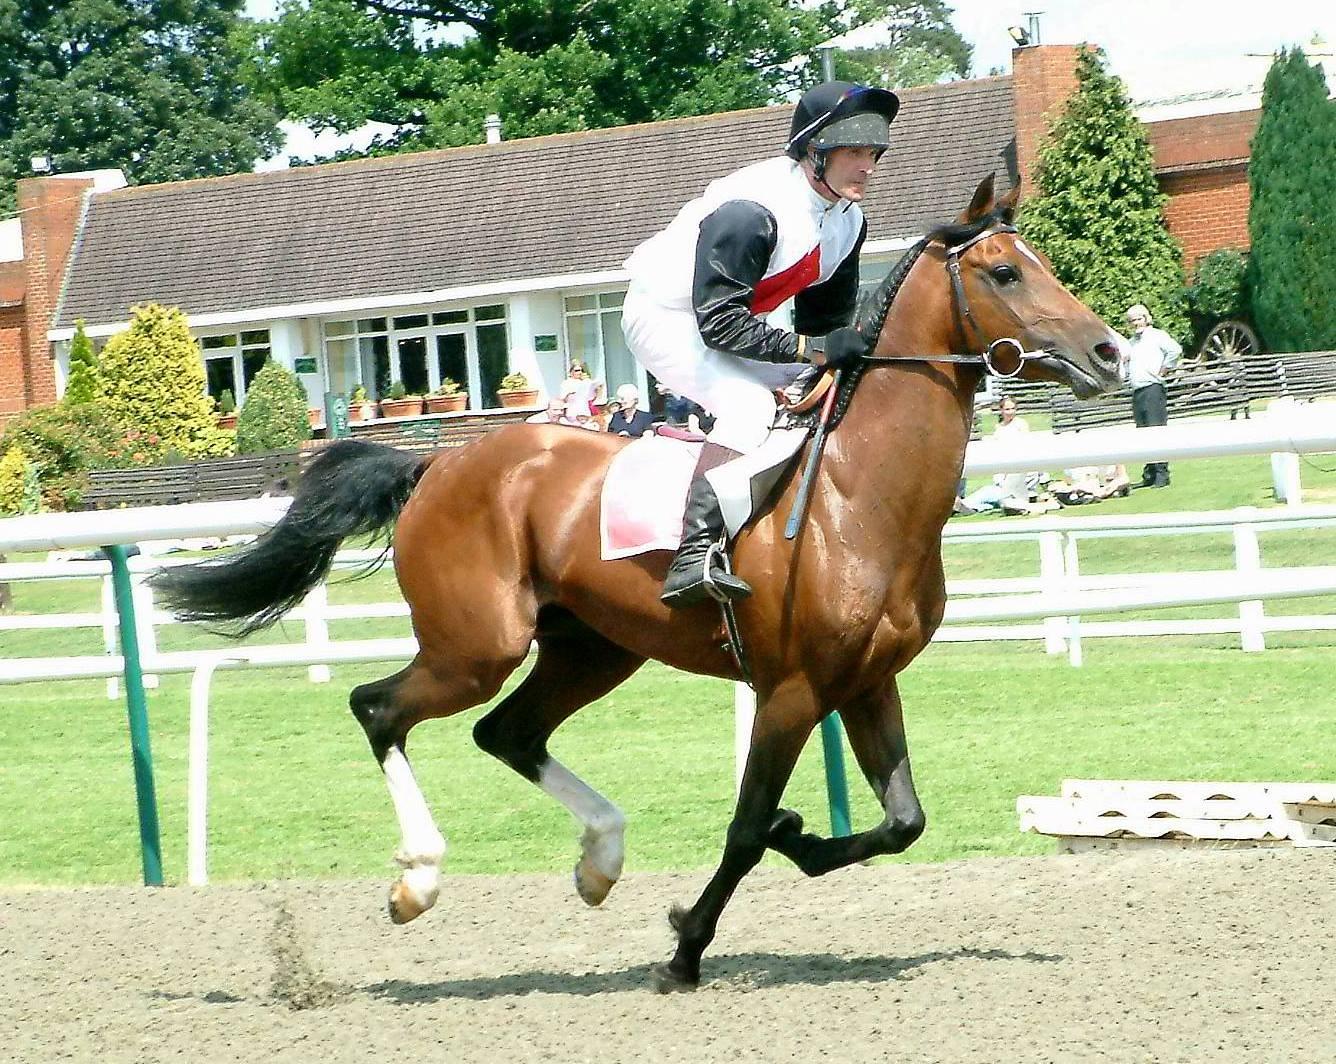 Bay thoroughbred stallion racing